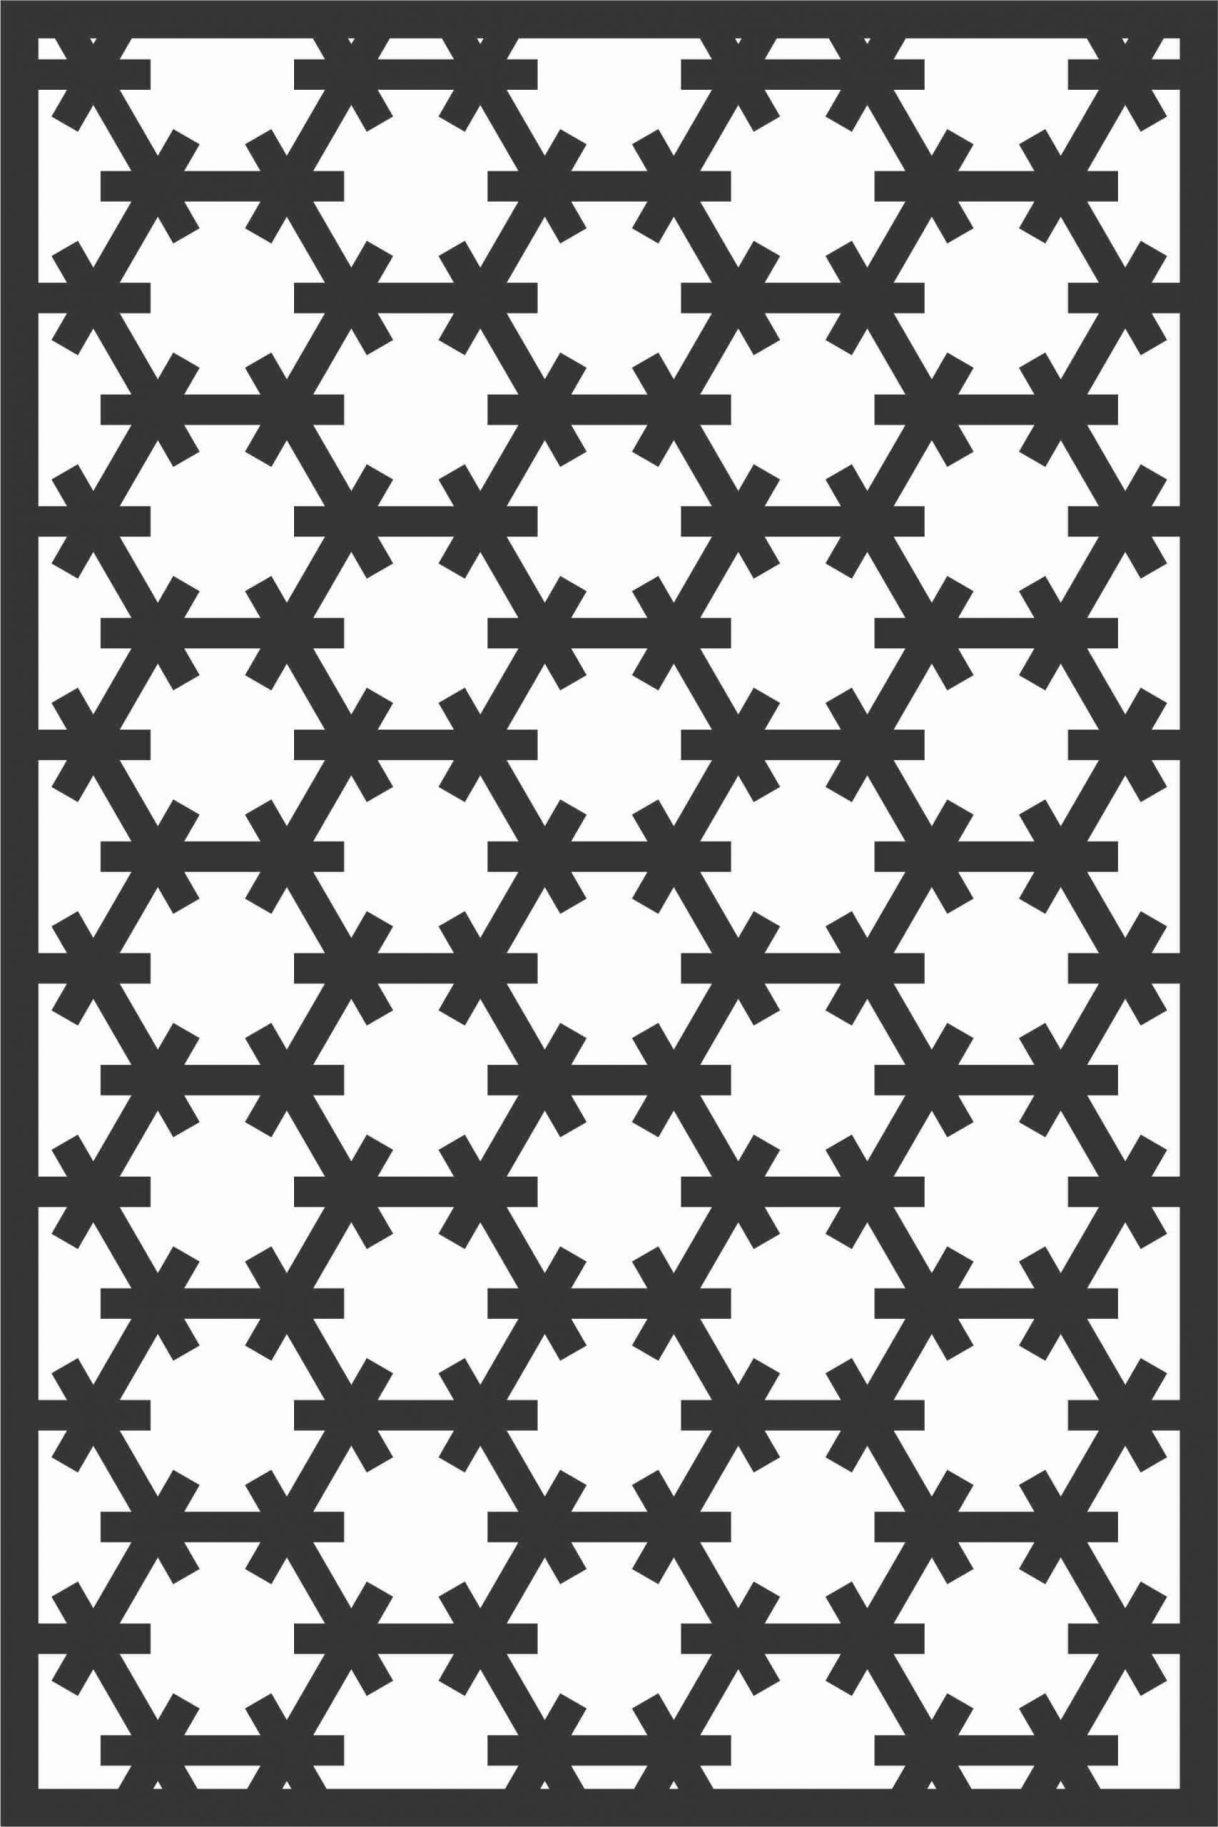 Screen Panel Patterns Seamless 57 Free DXF File